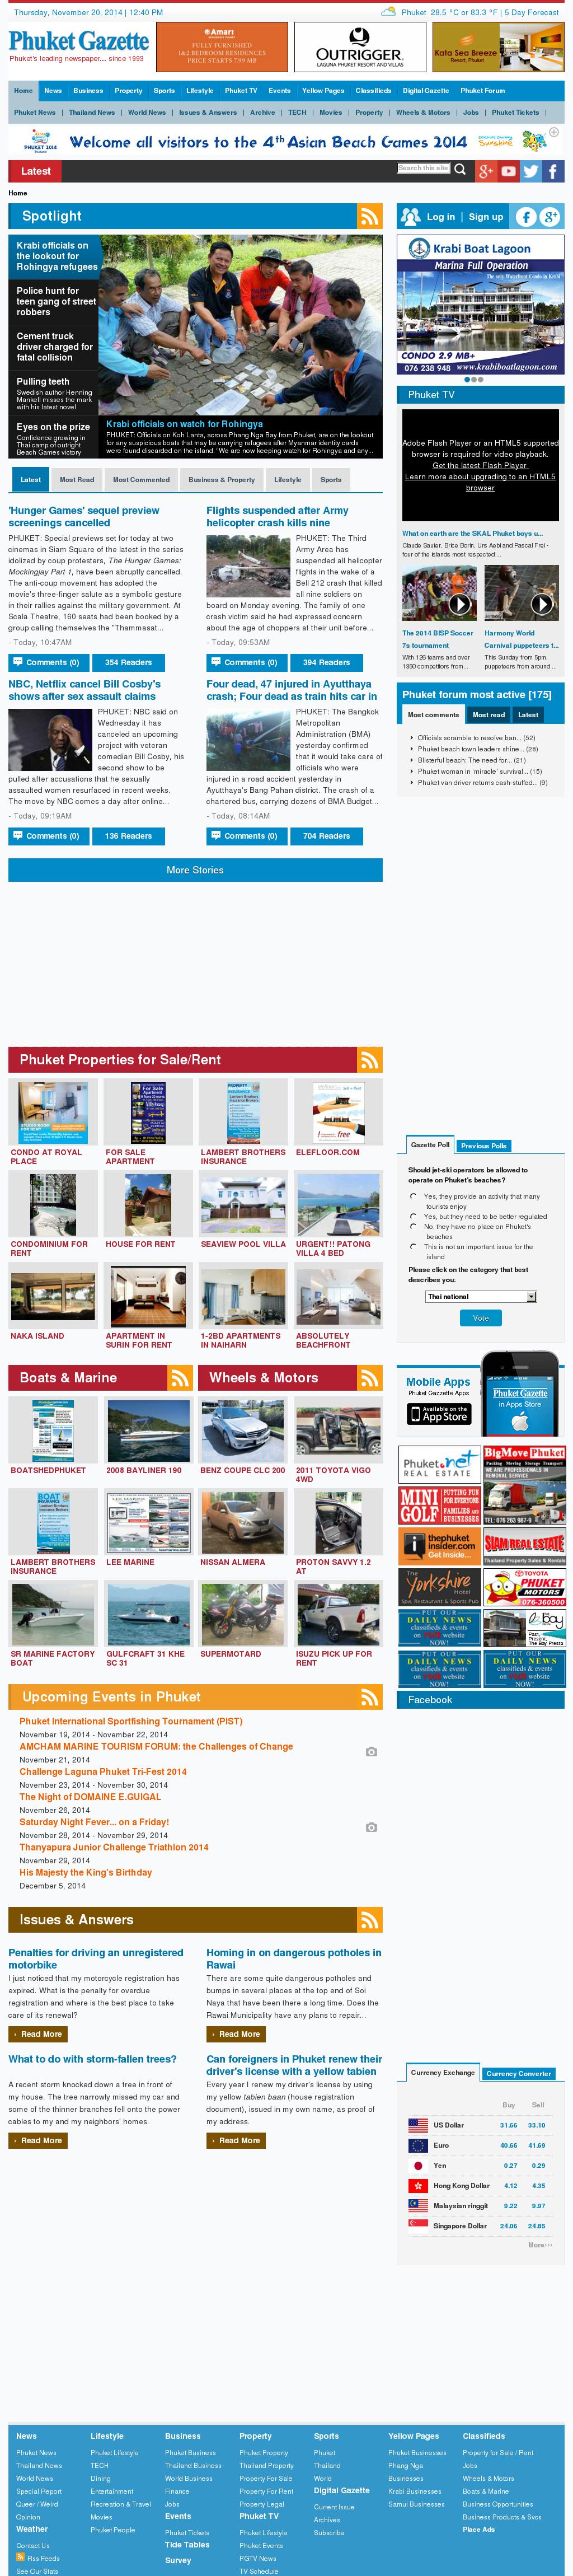 Phuketgazette Competitors, Revenue and Employees - Owler